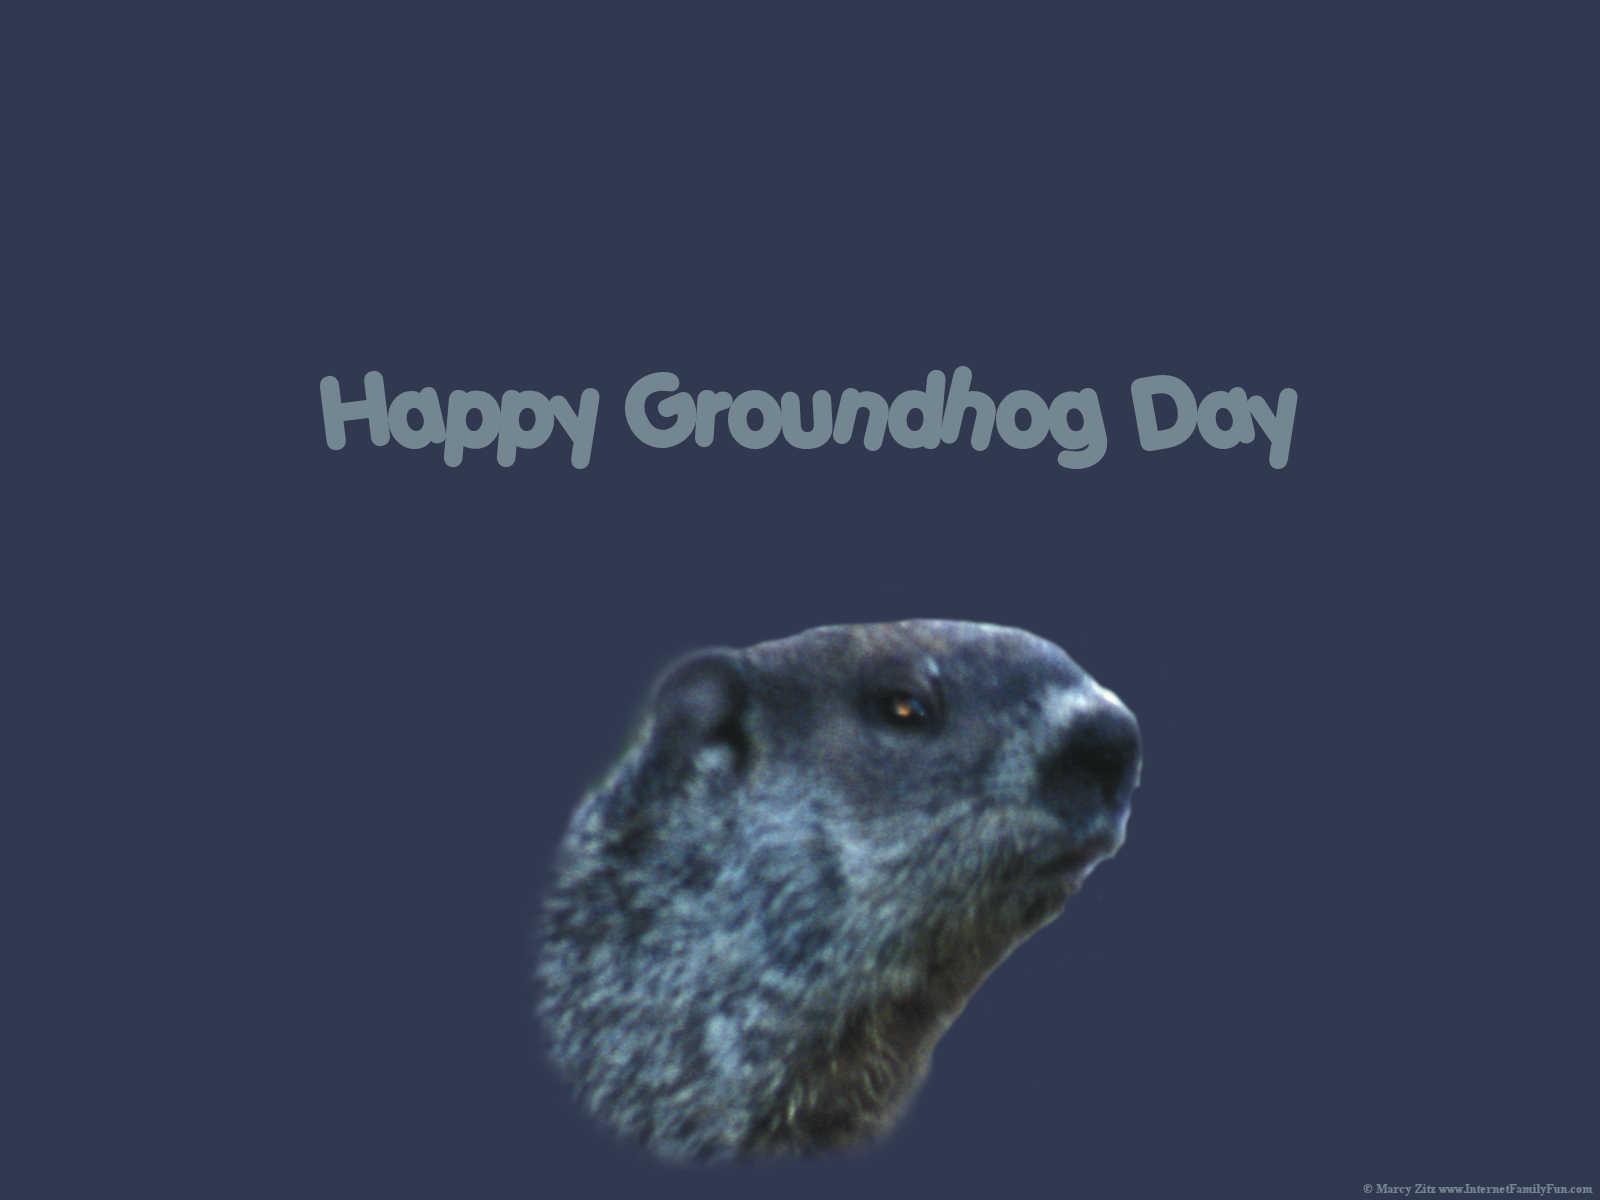 75] Groundhog Day Wallpaper on WallpaperSafari 1600x1200